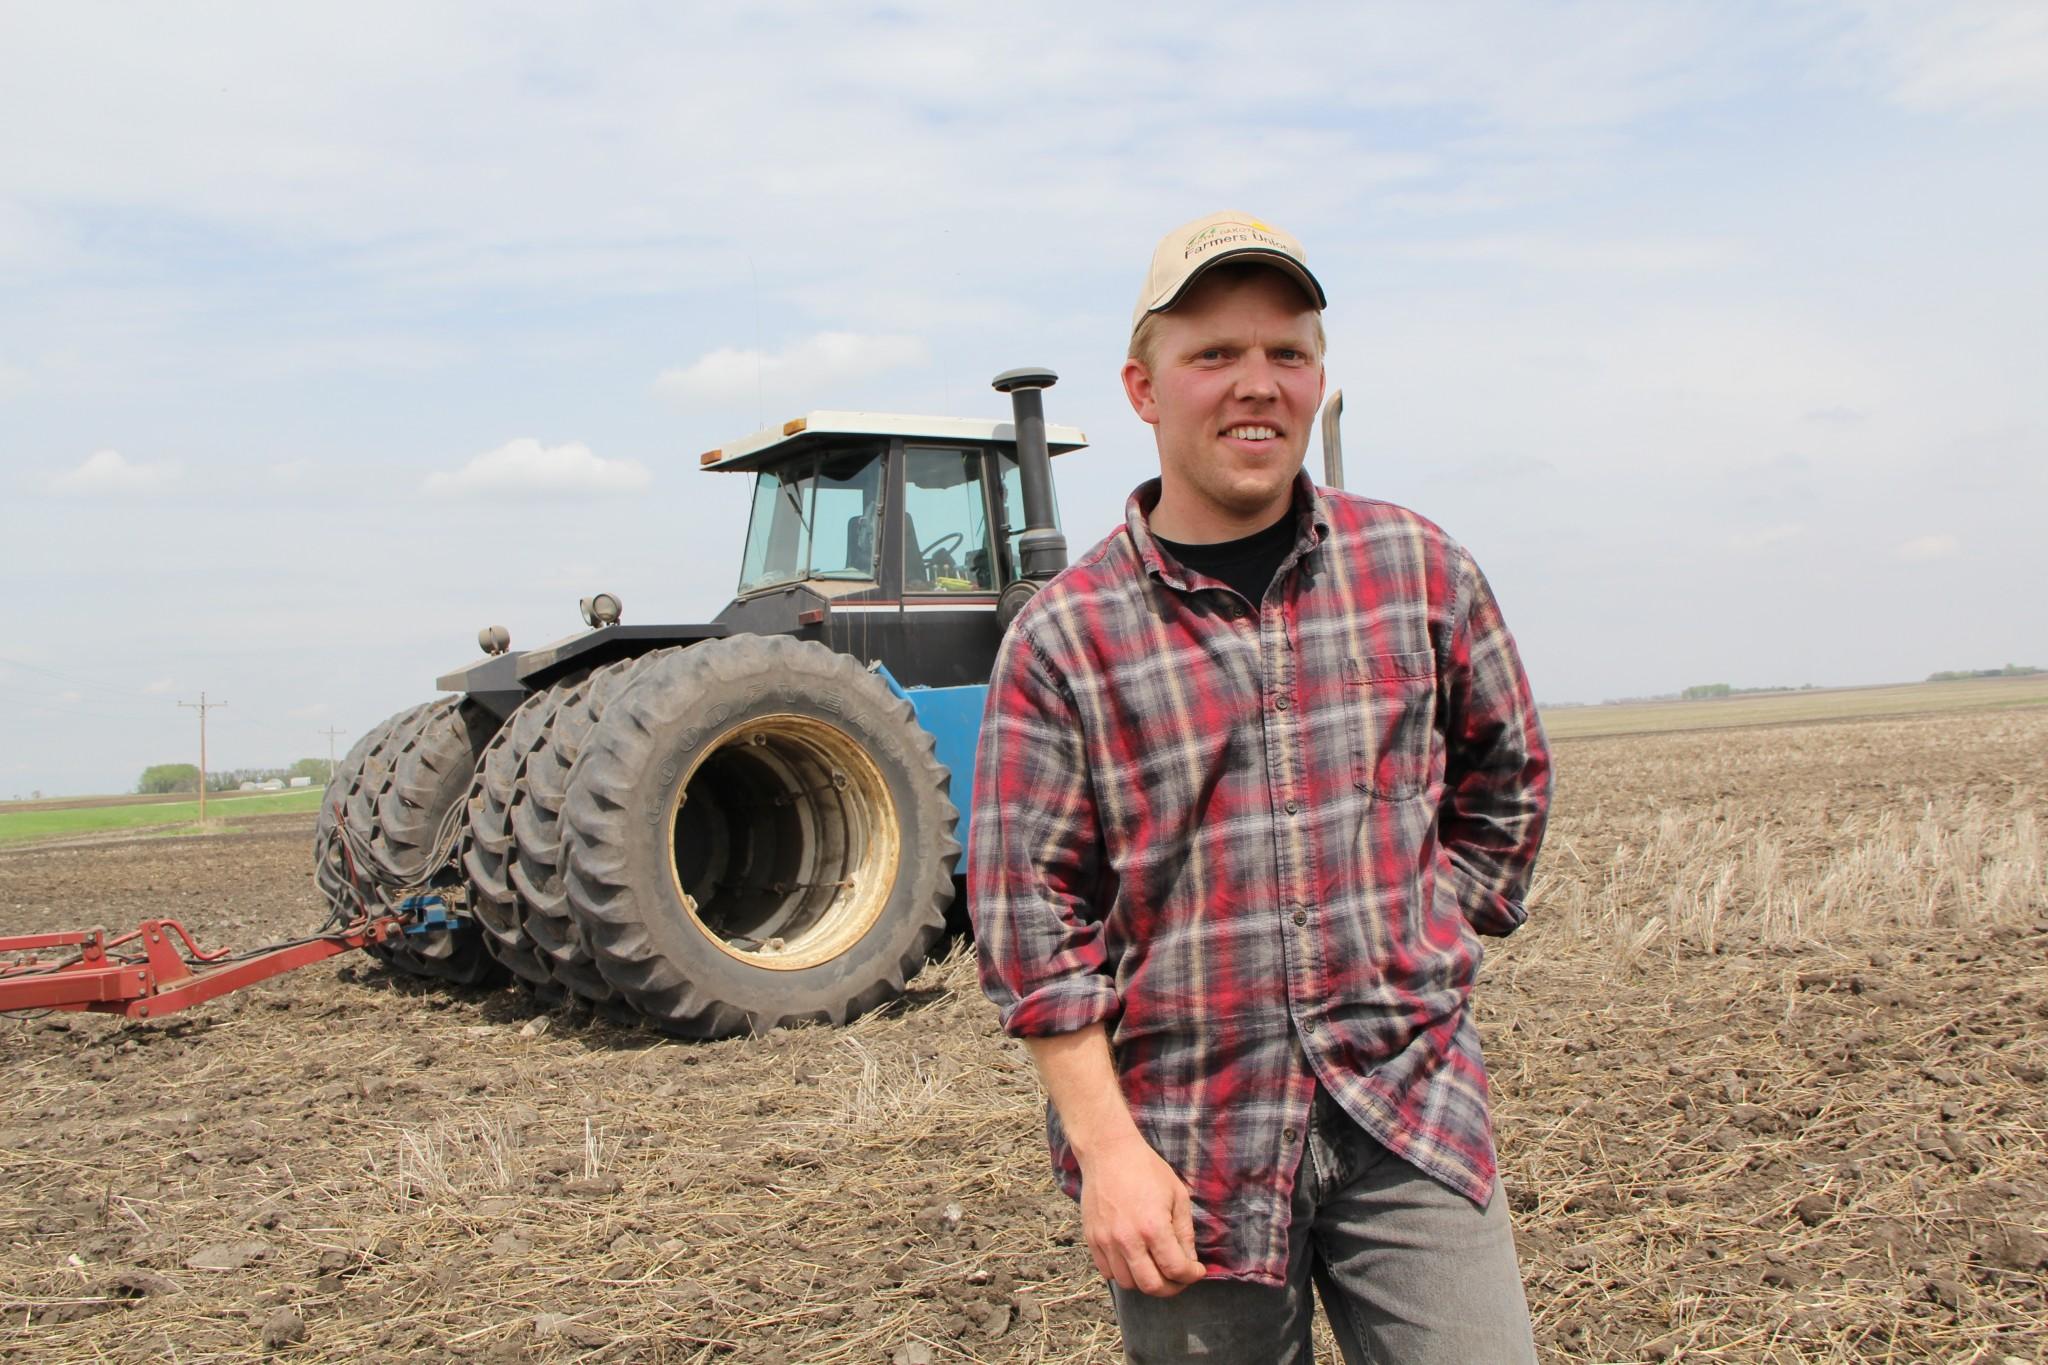 farmer-826912.jpg